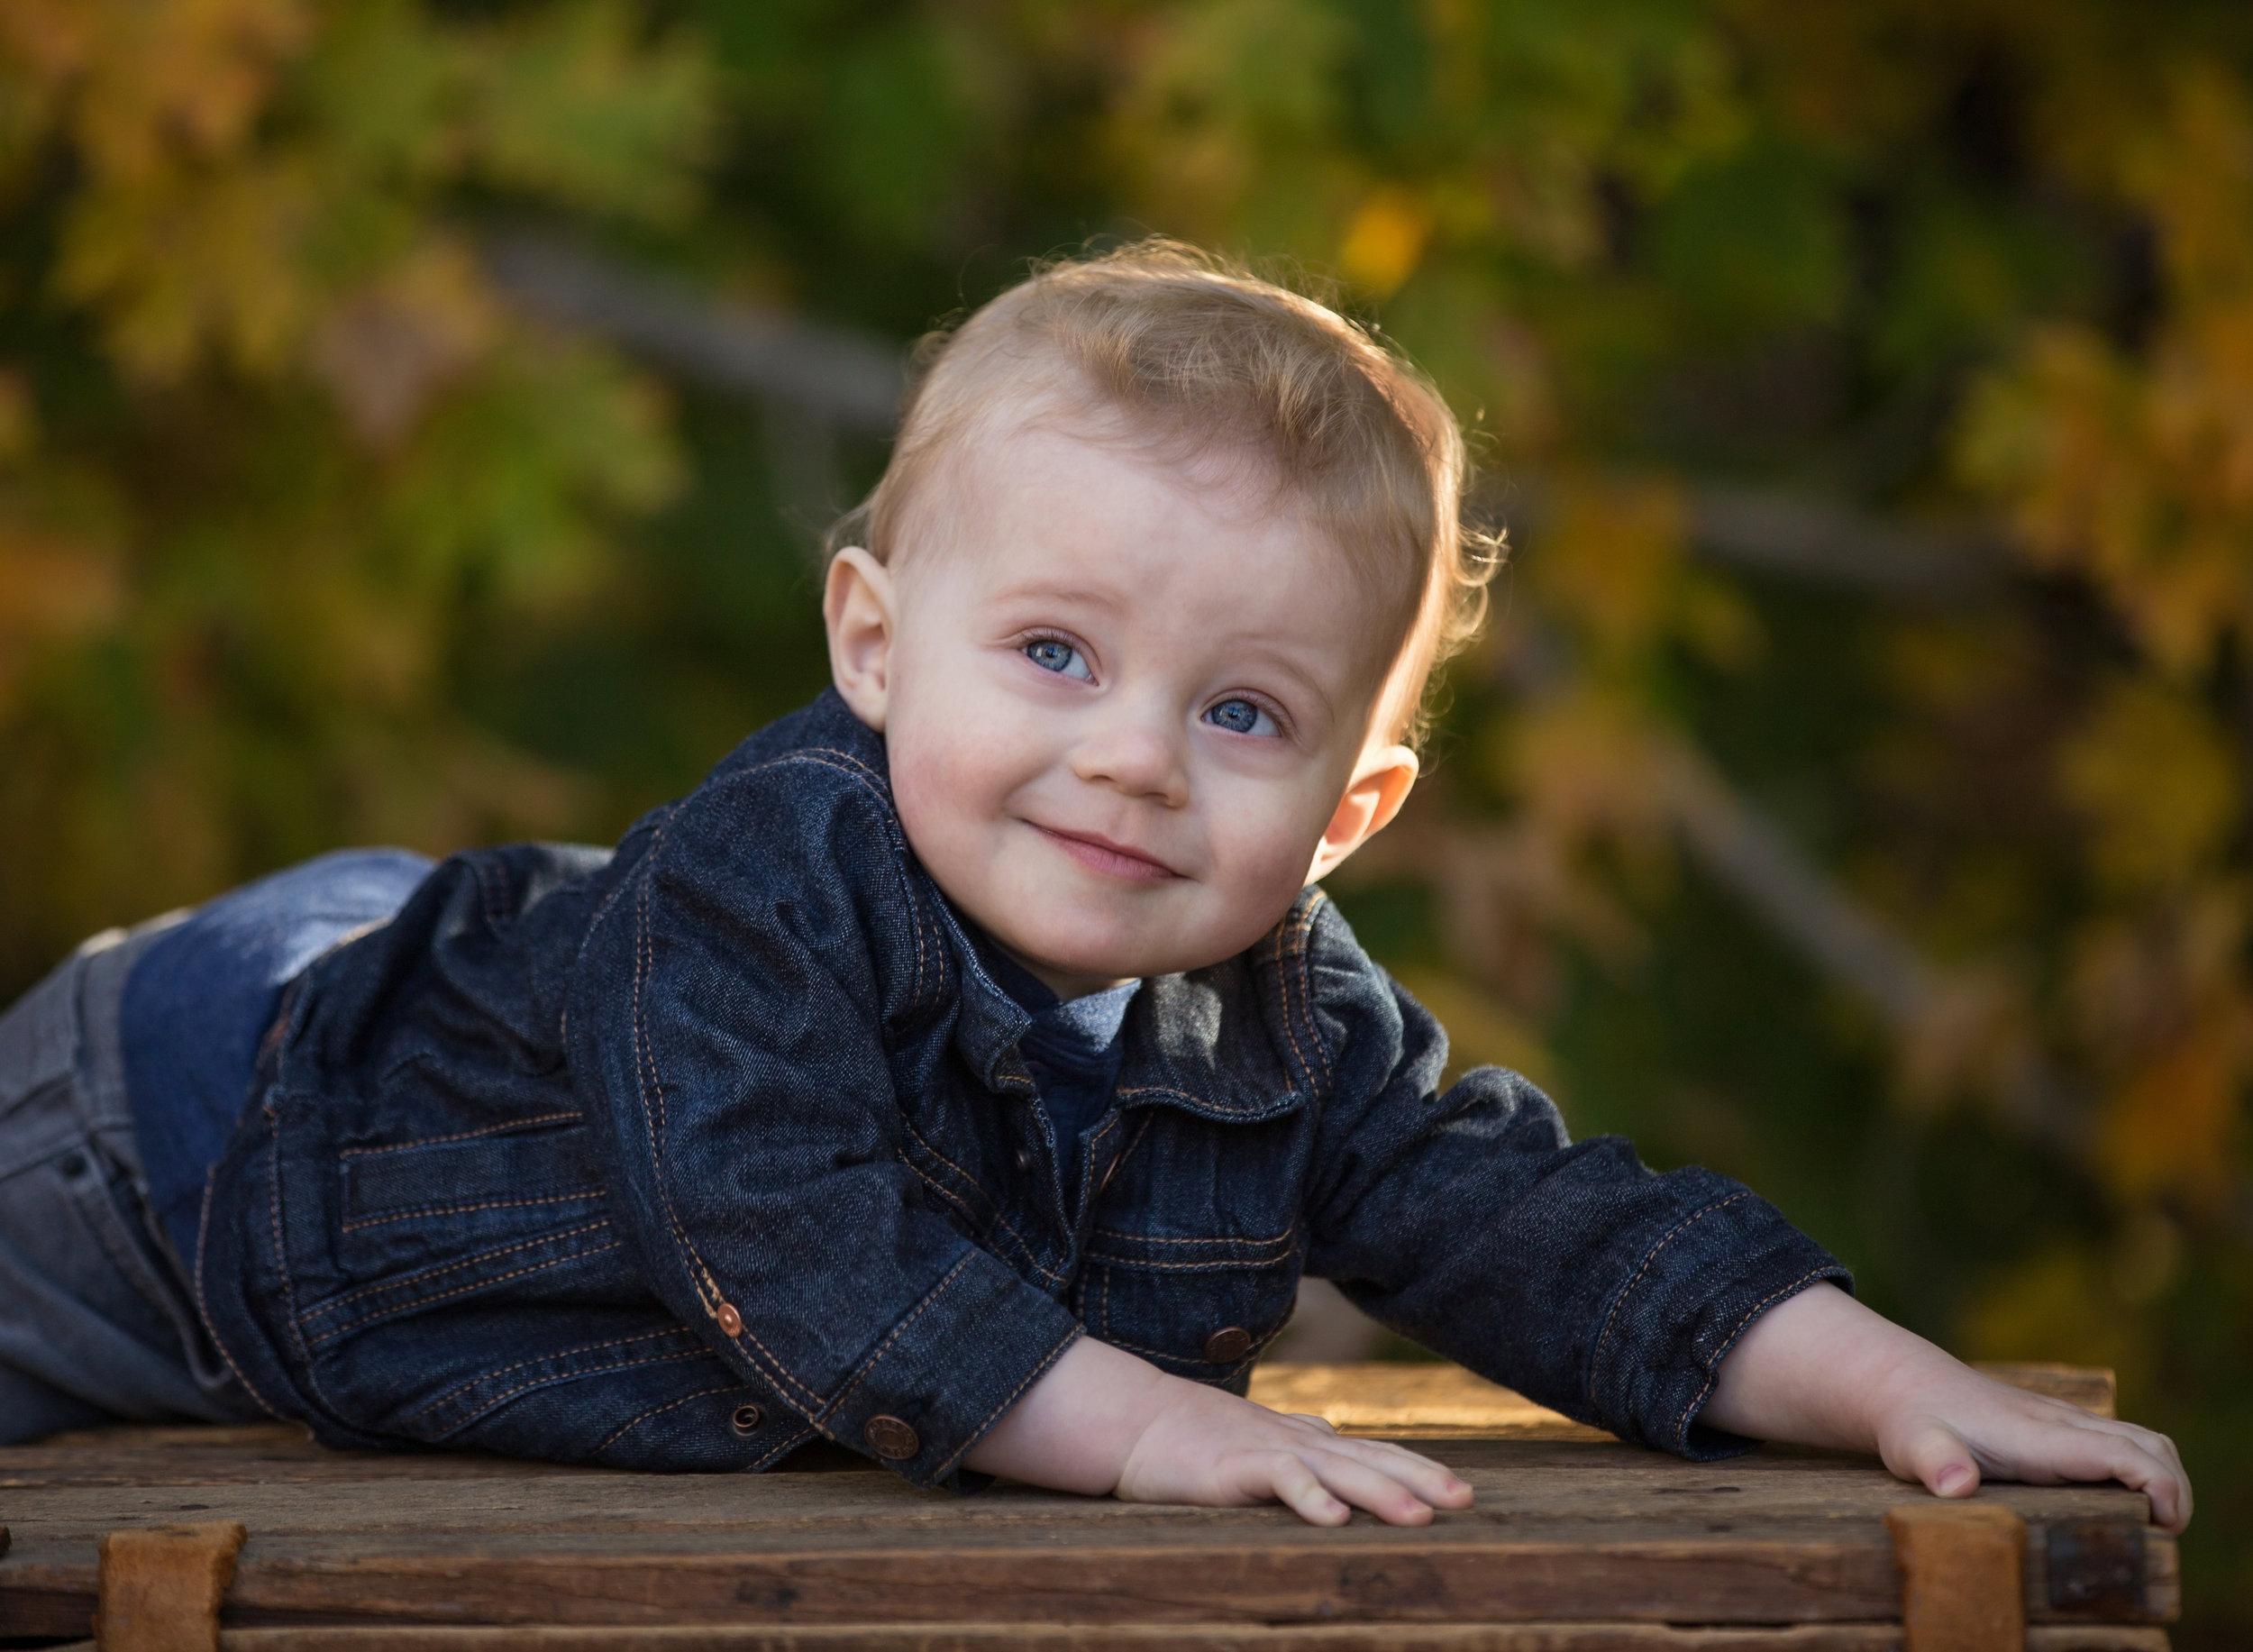 St_Louis_Childrens_Photographer_007.jpg